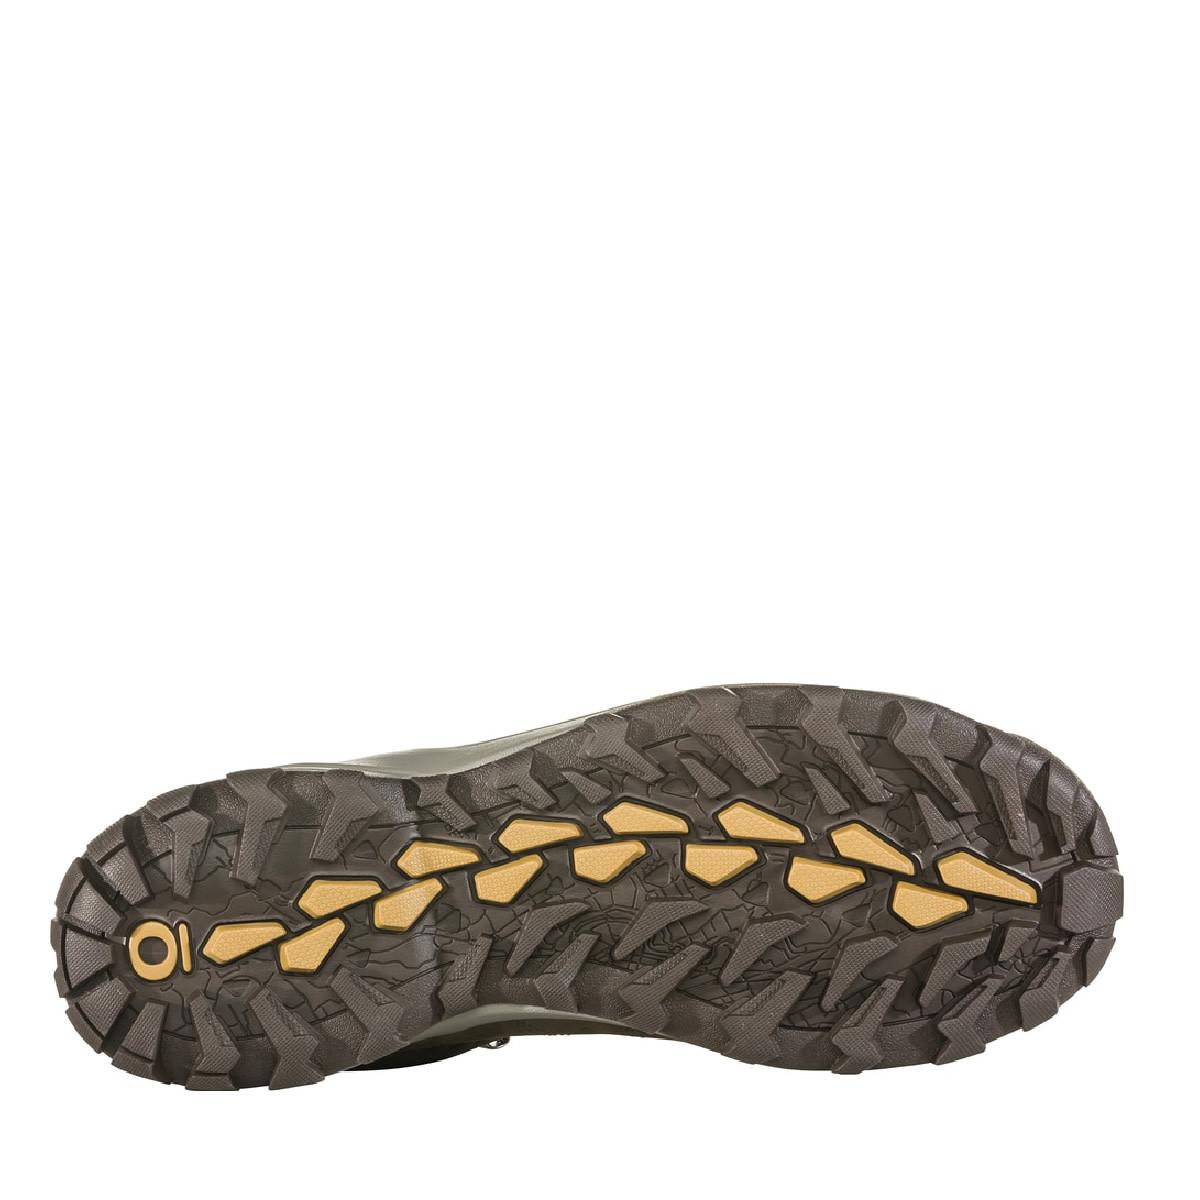 Oboz Sypes Leather B-Dry Wood